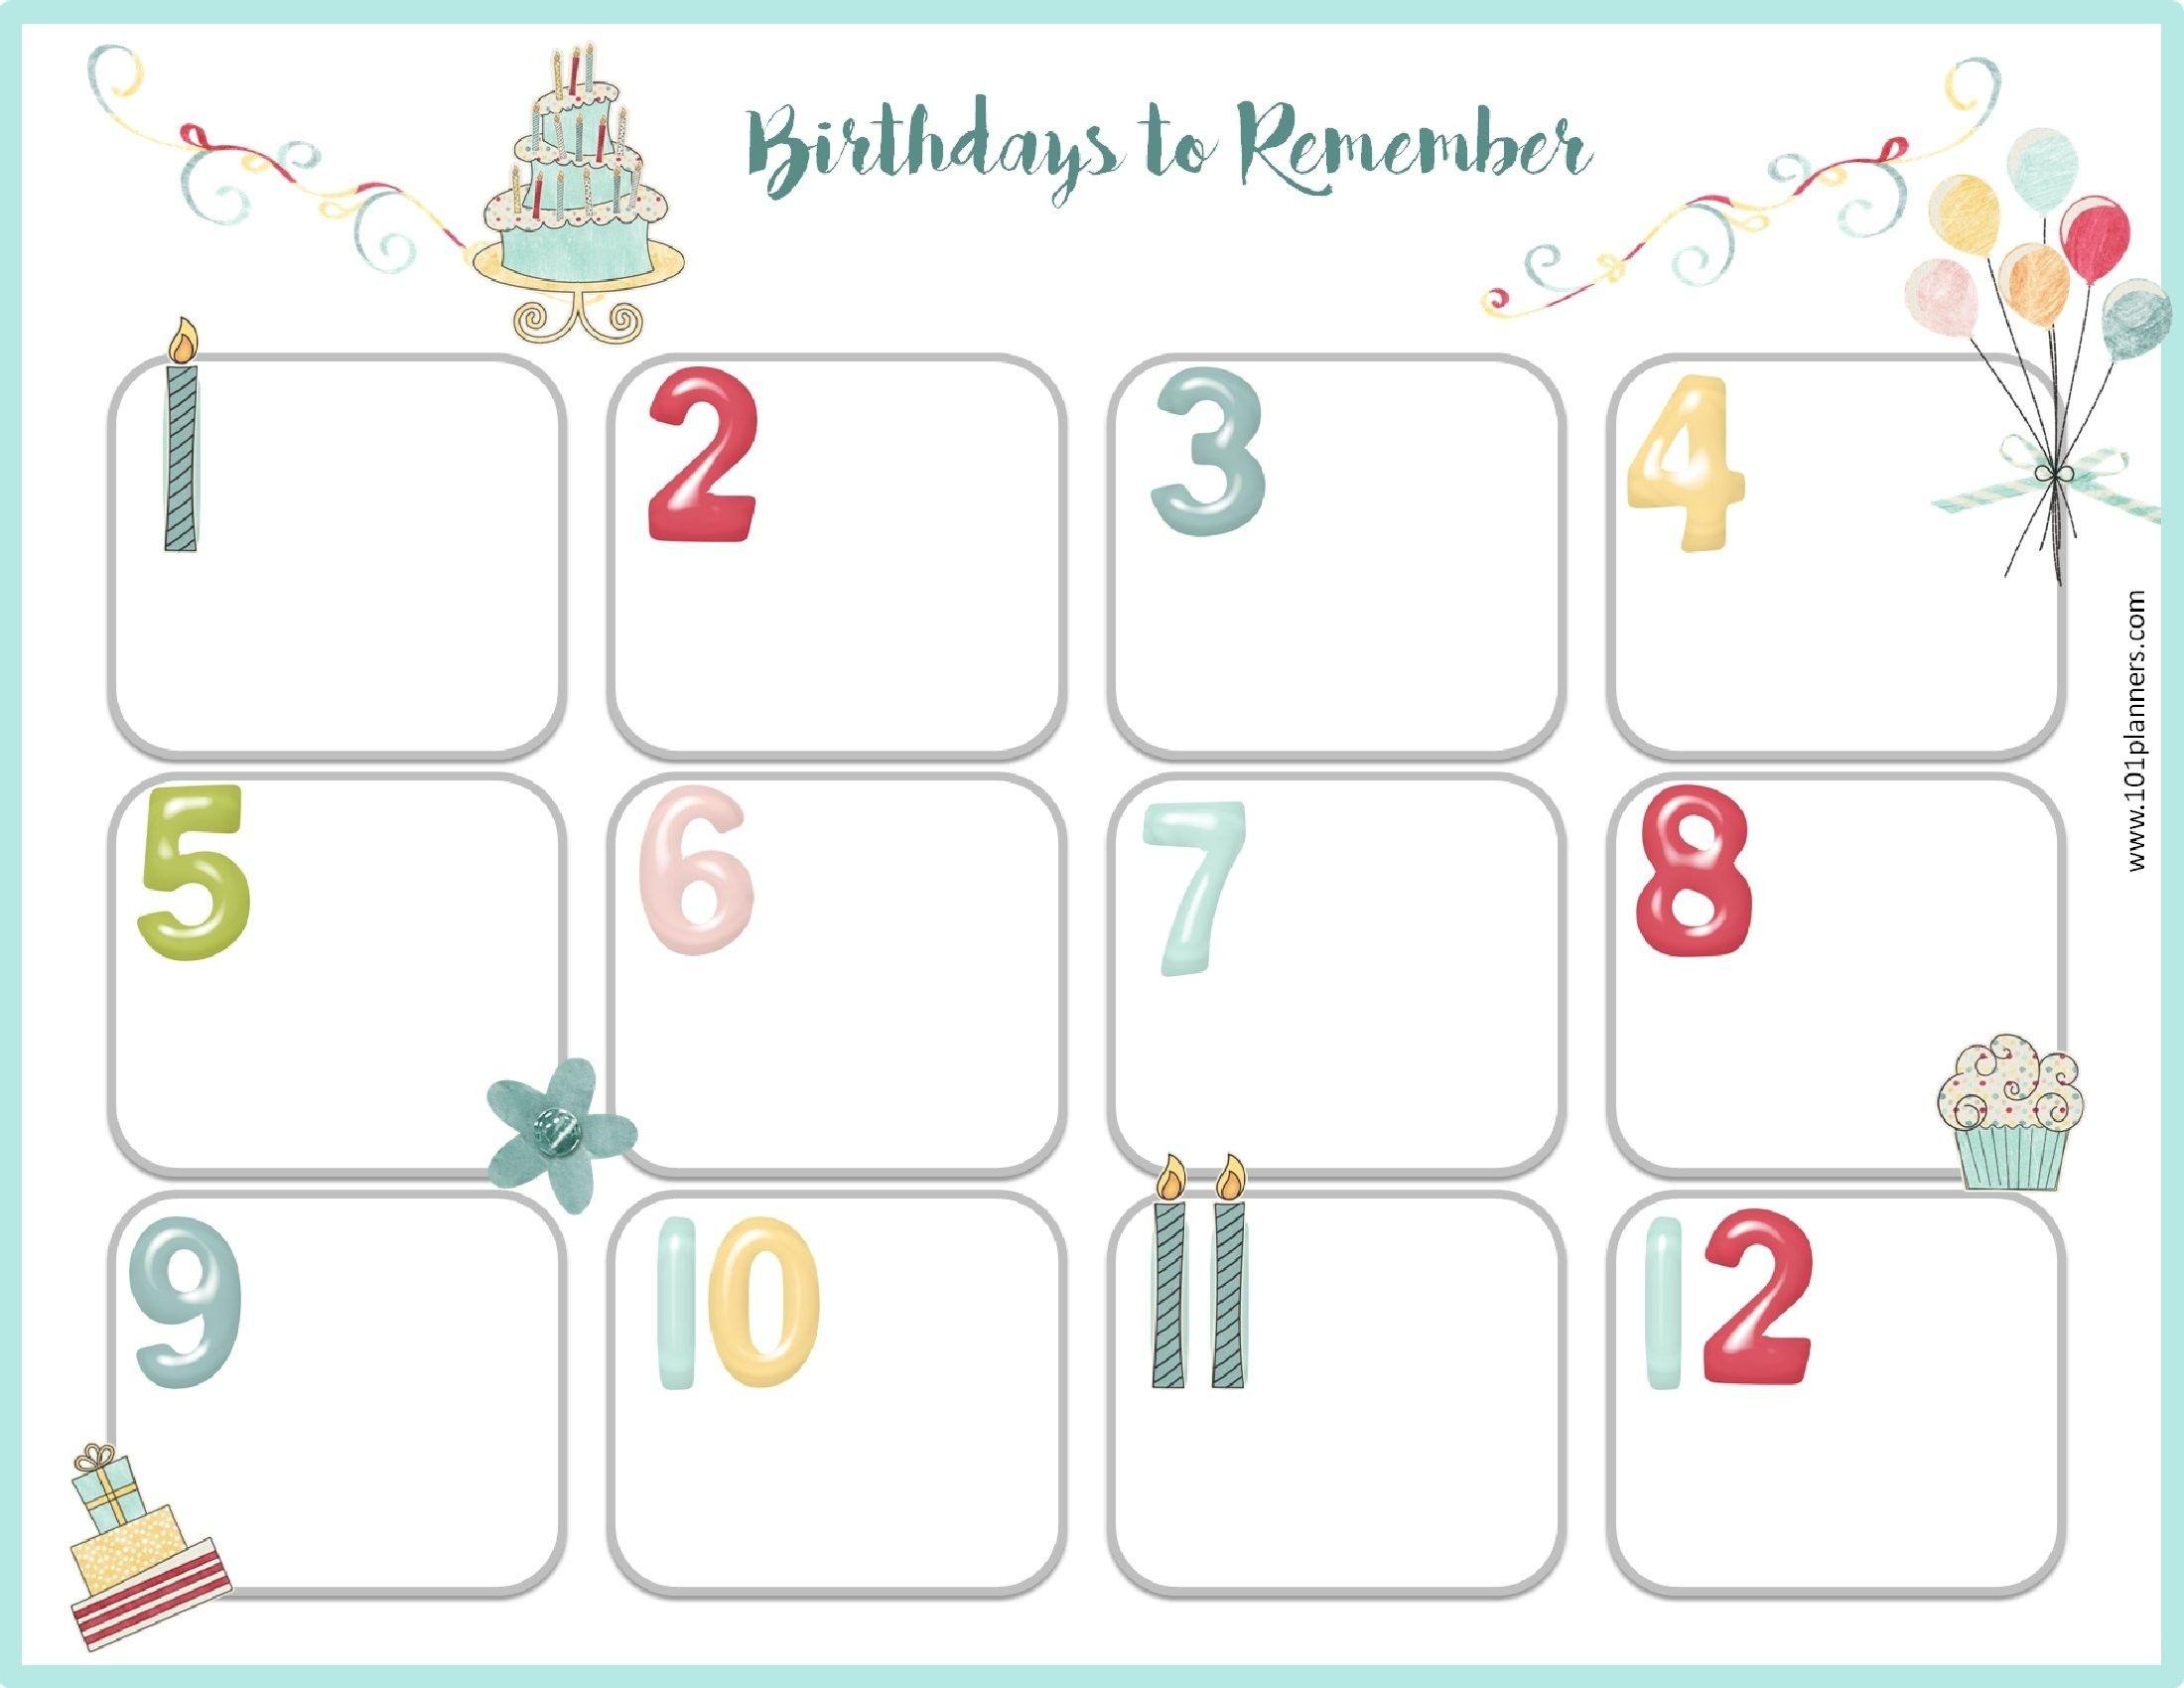 Free Birthday Calendar Beautiful Calendars Templates In Birthday